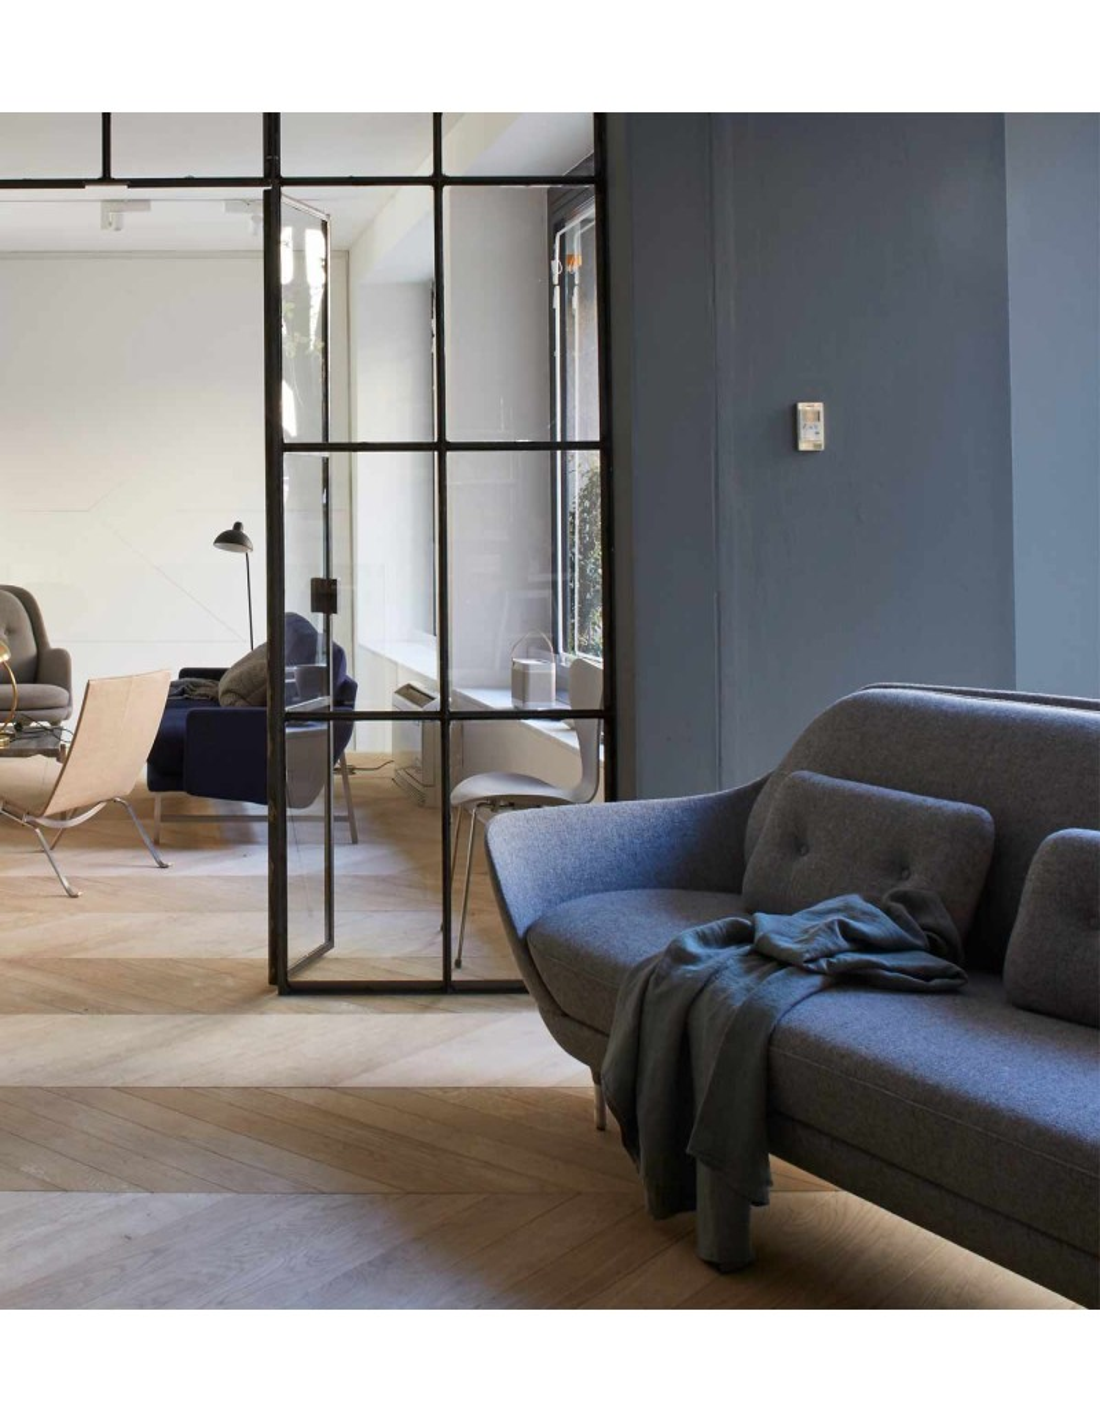 Sofa Favn By Jaime Hayon For Fritz Hansen